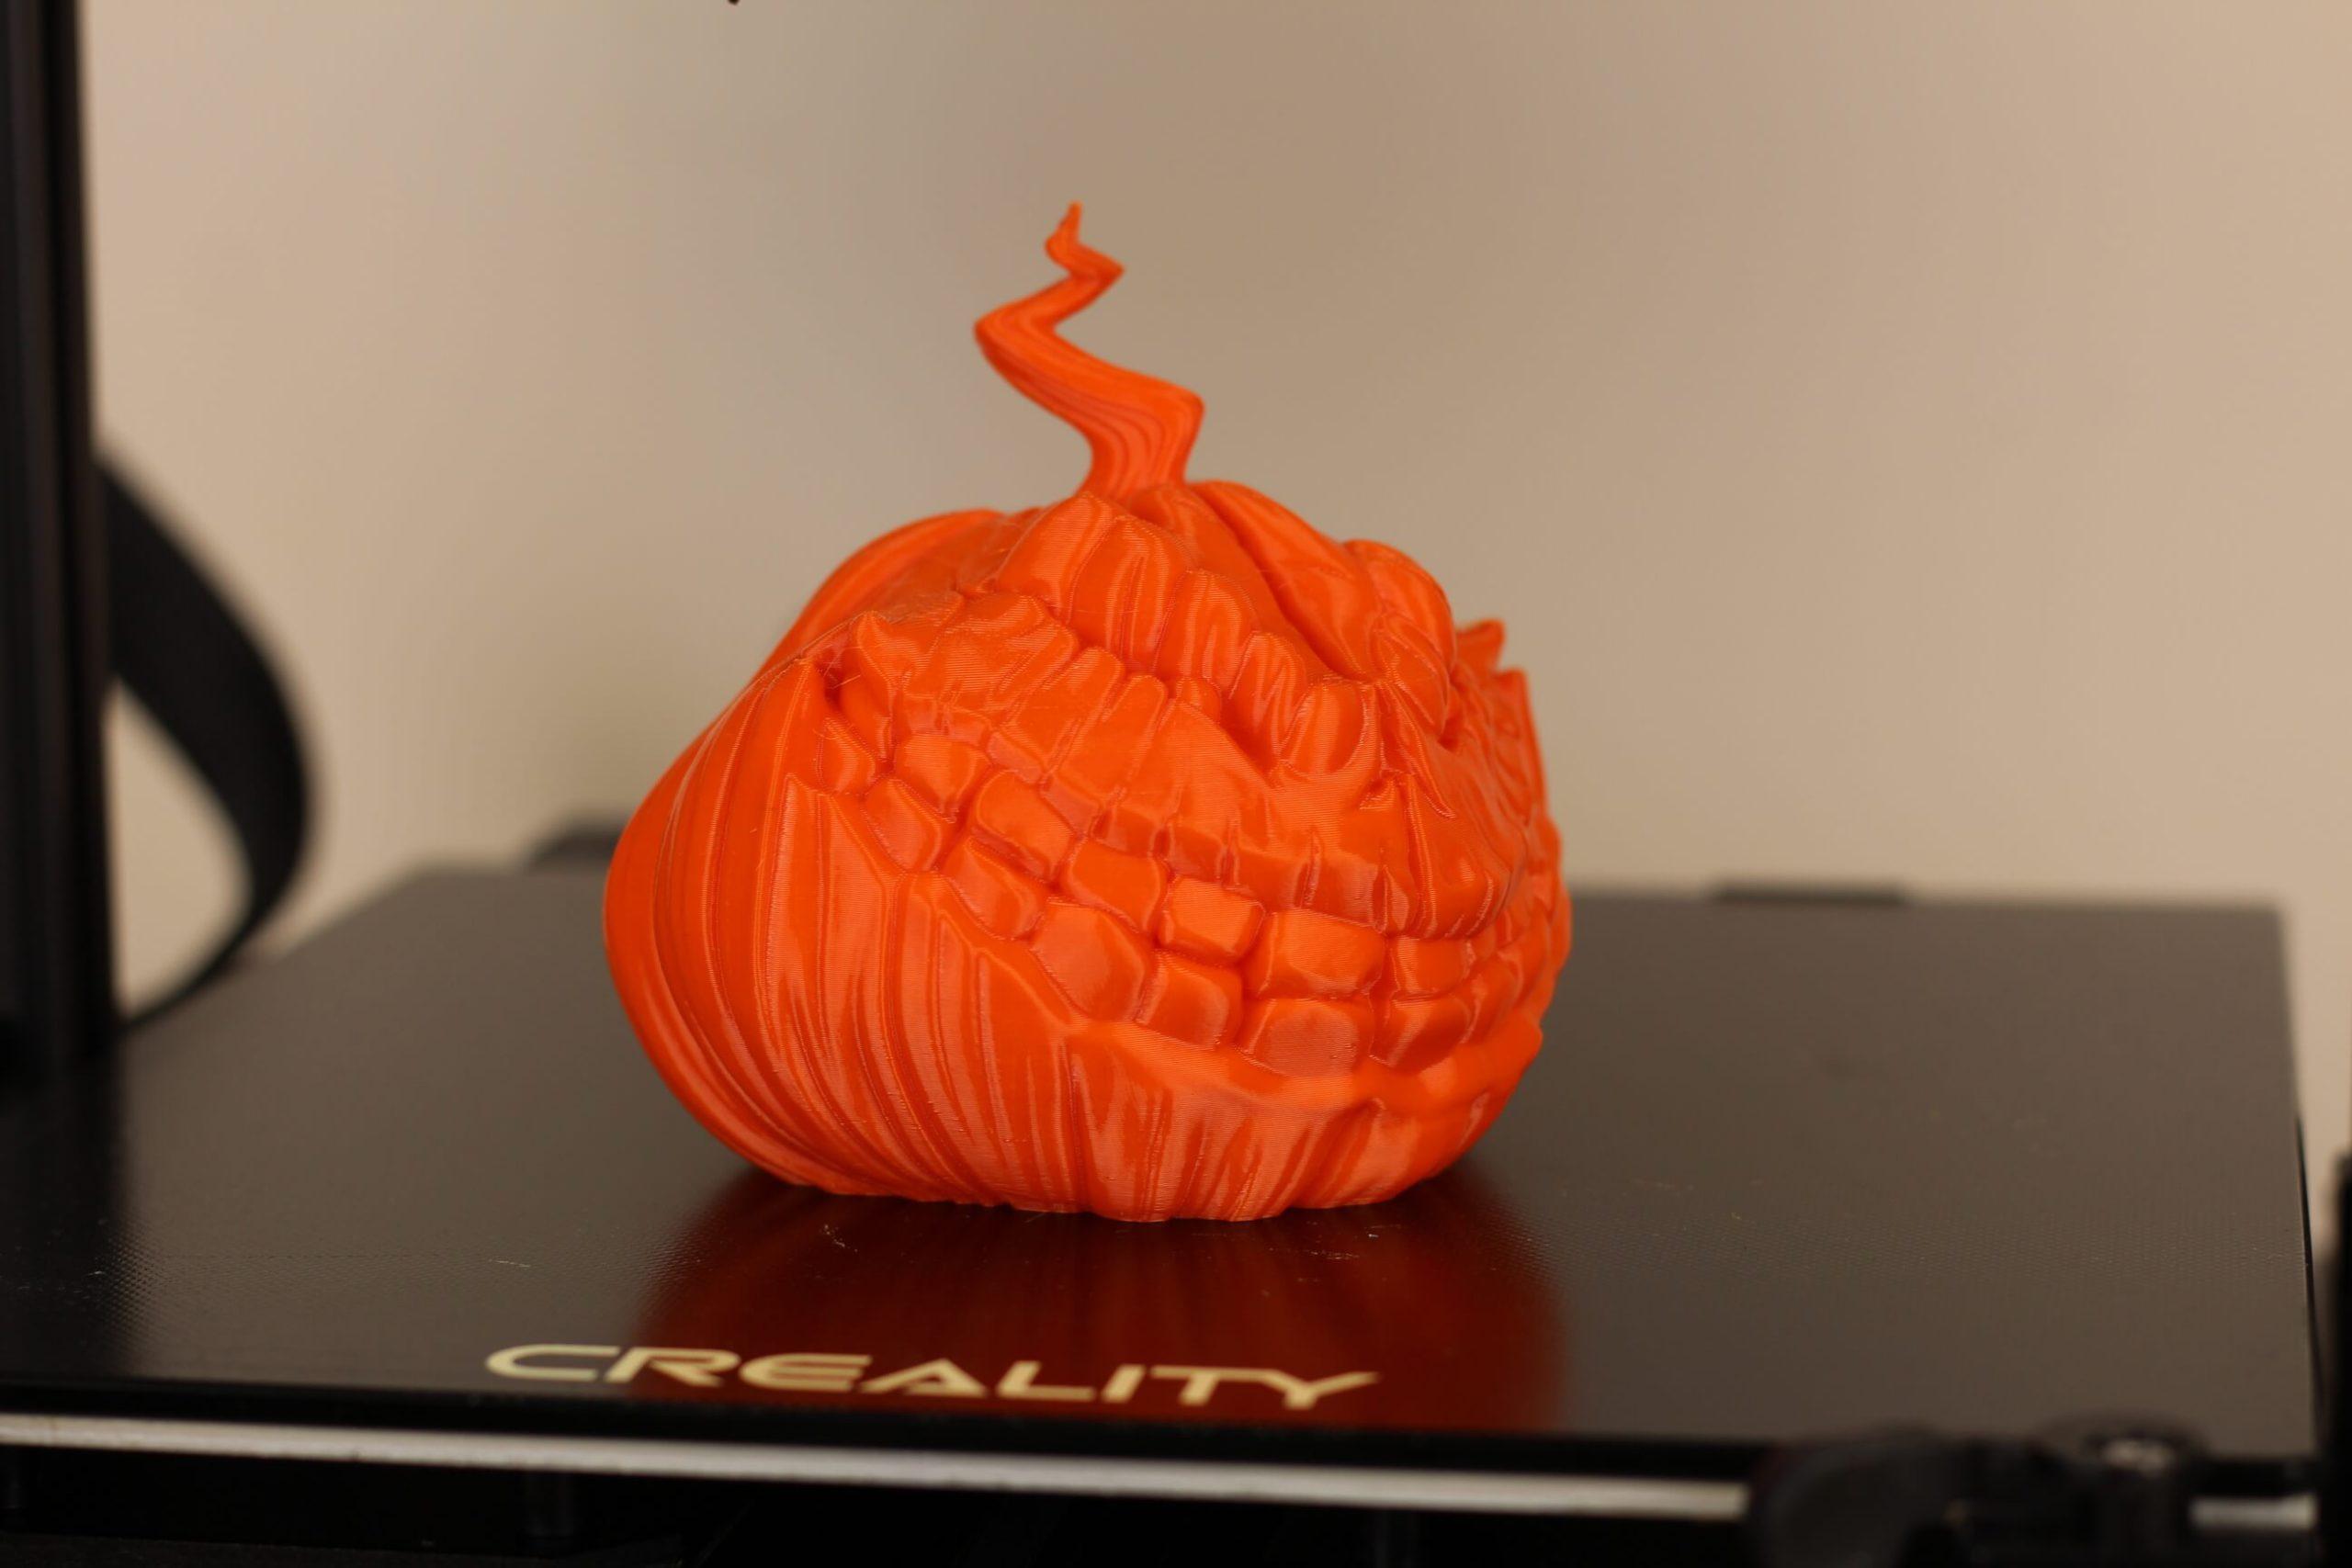 Grinning-Pumpkin-PETG-print-on-CR-6-SE-5